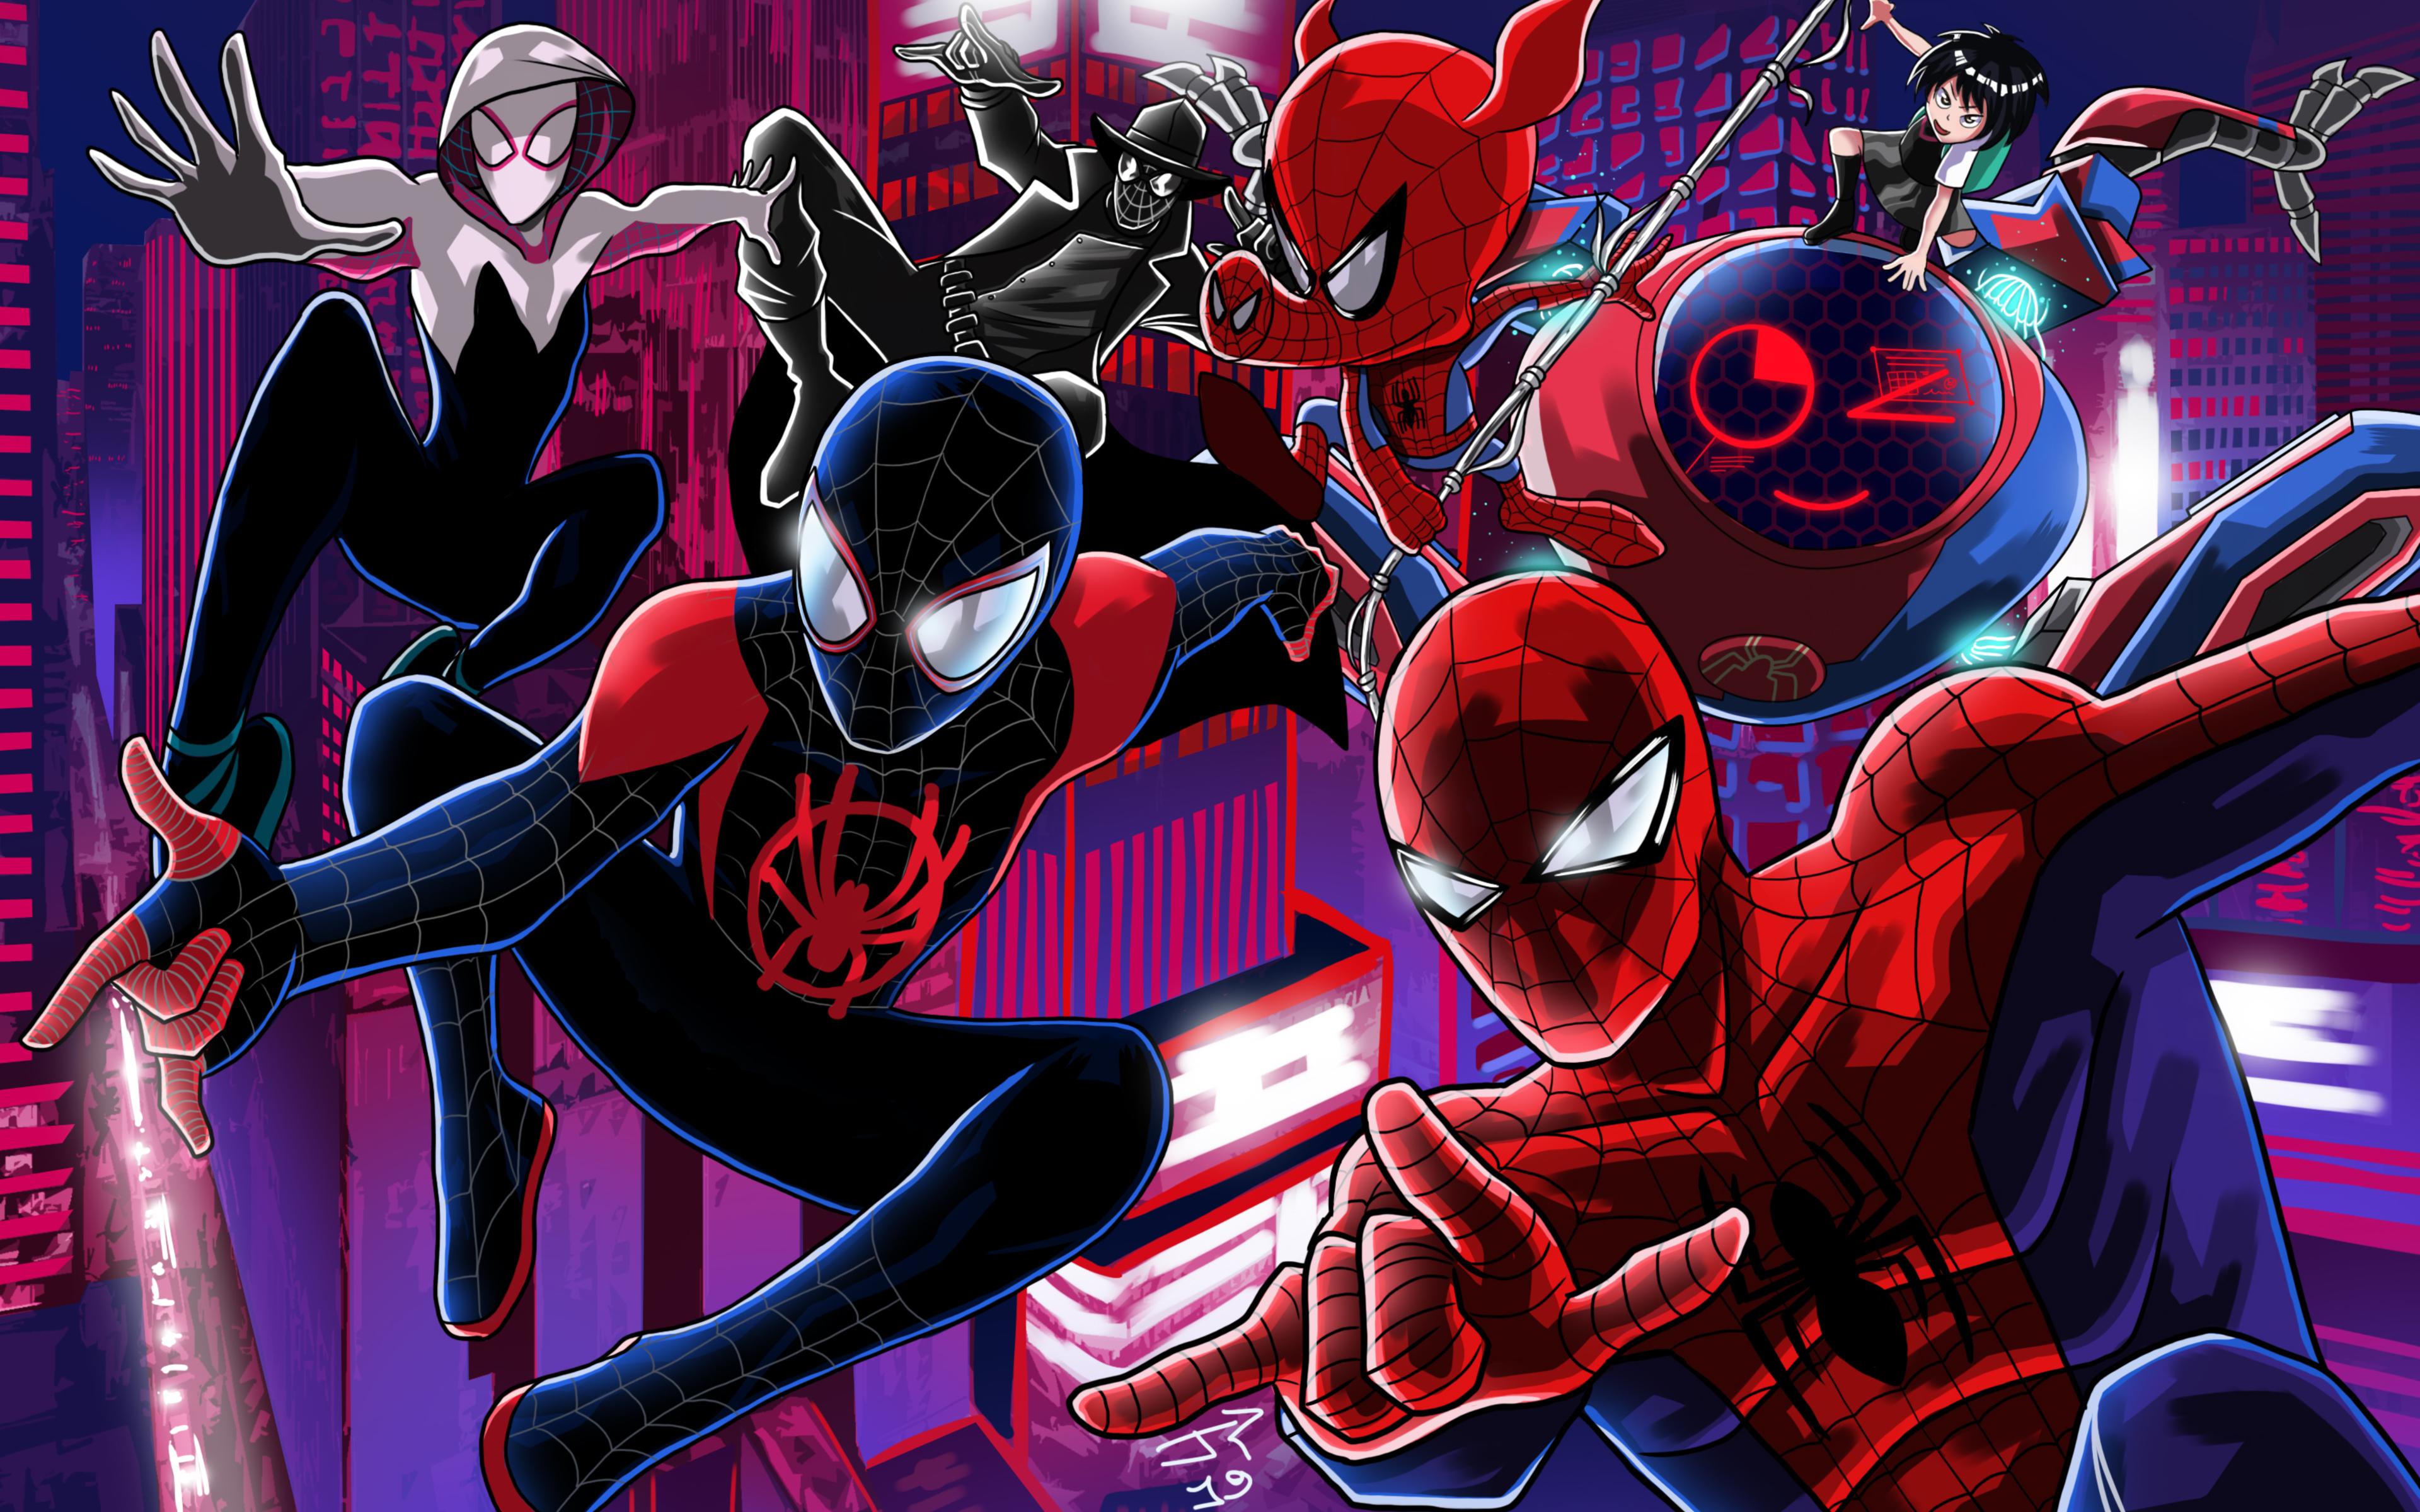 3840x2400 Spider Verse Artwork 4k HD 4k Wallpapers, Images ...